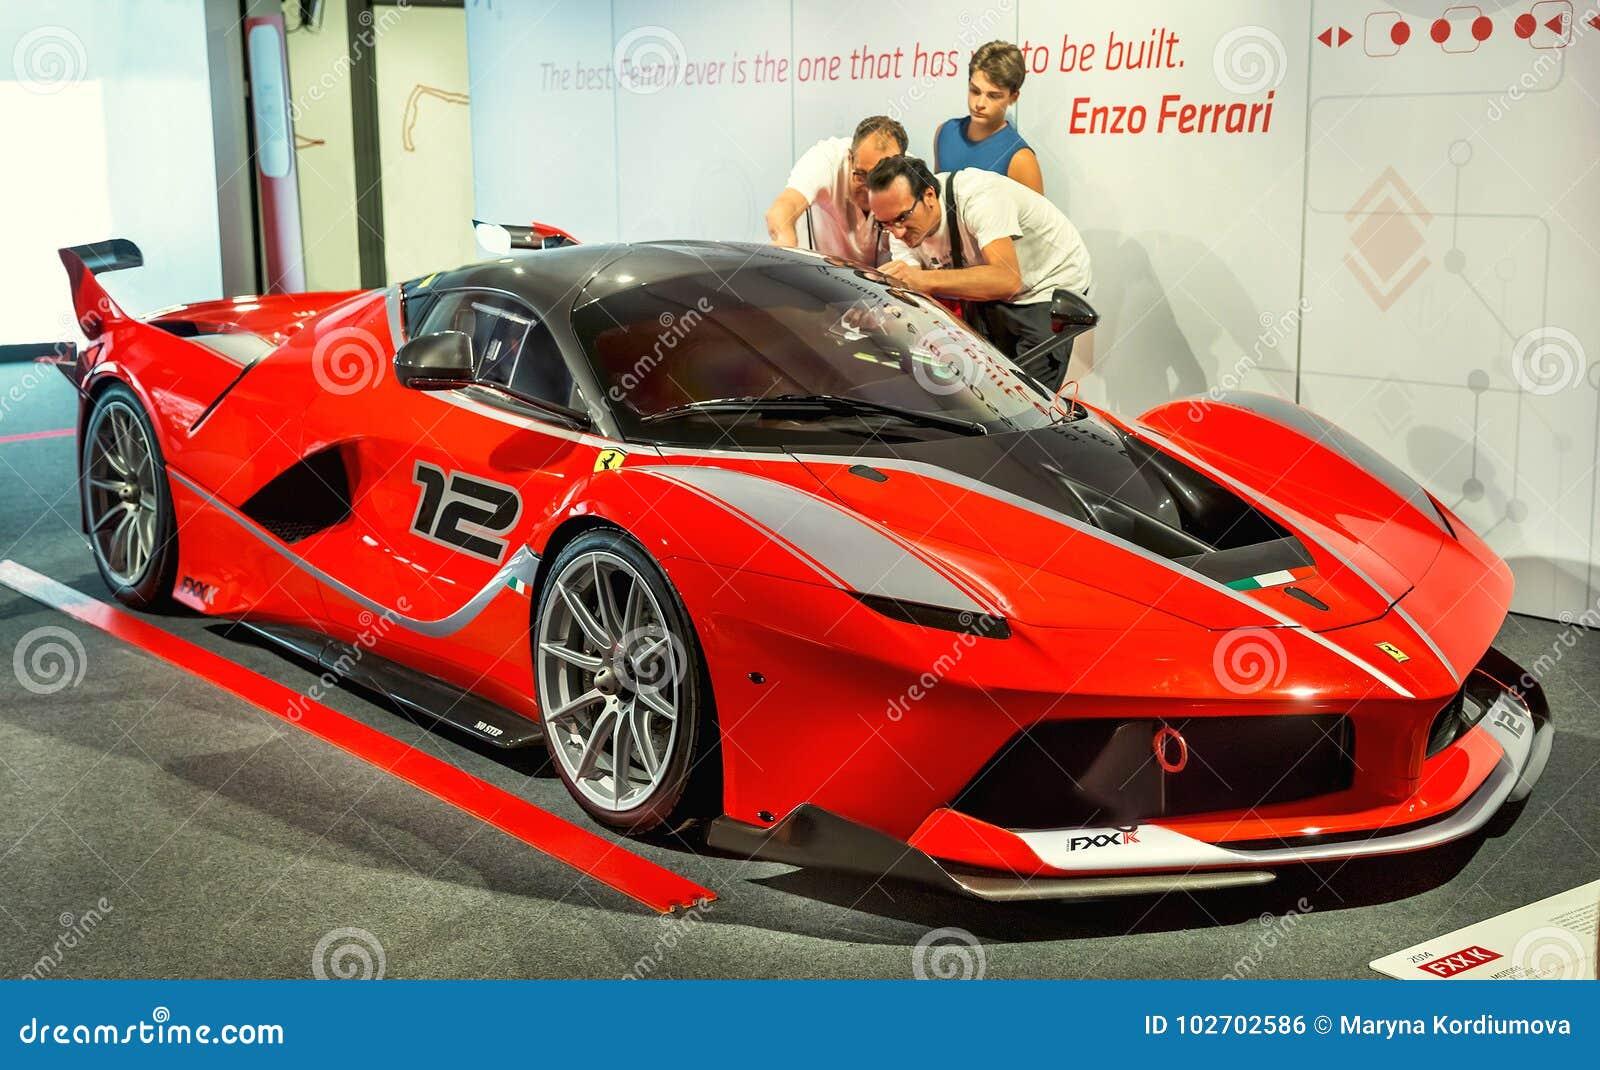 Maranello Italy A July 26 2017 Exhibition In The Famous Ferrari